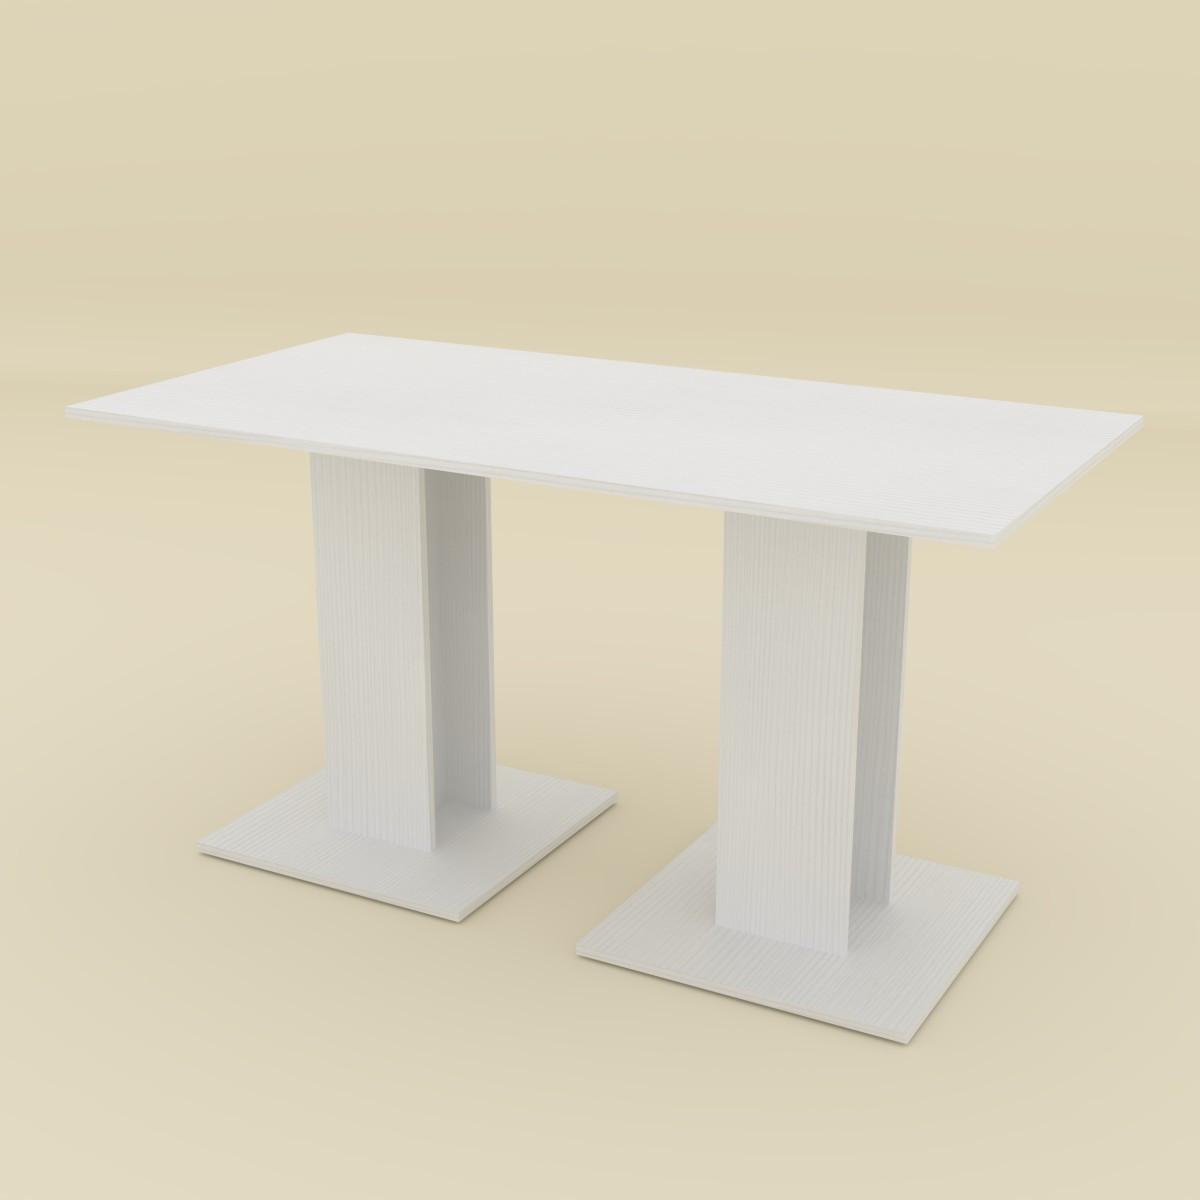 Стол кухонный КС-8 нимфея альба (белый) Компанит (140х70х74 см)